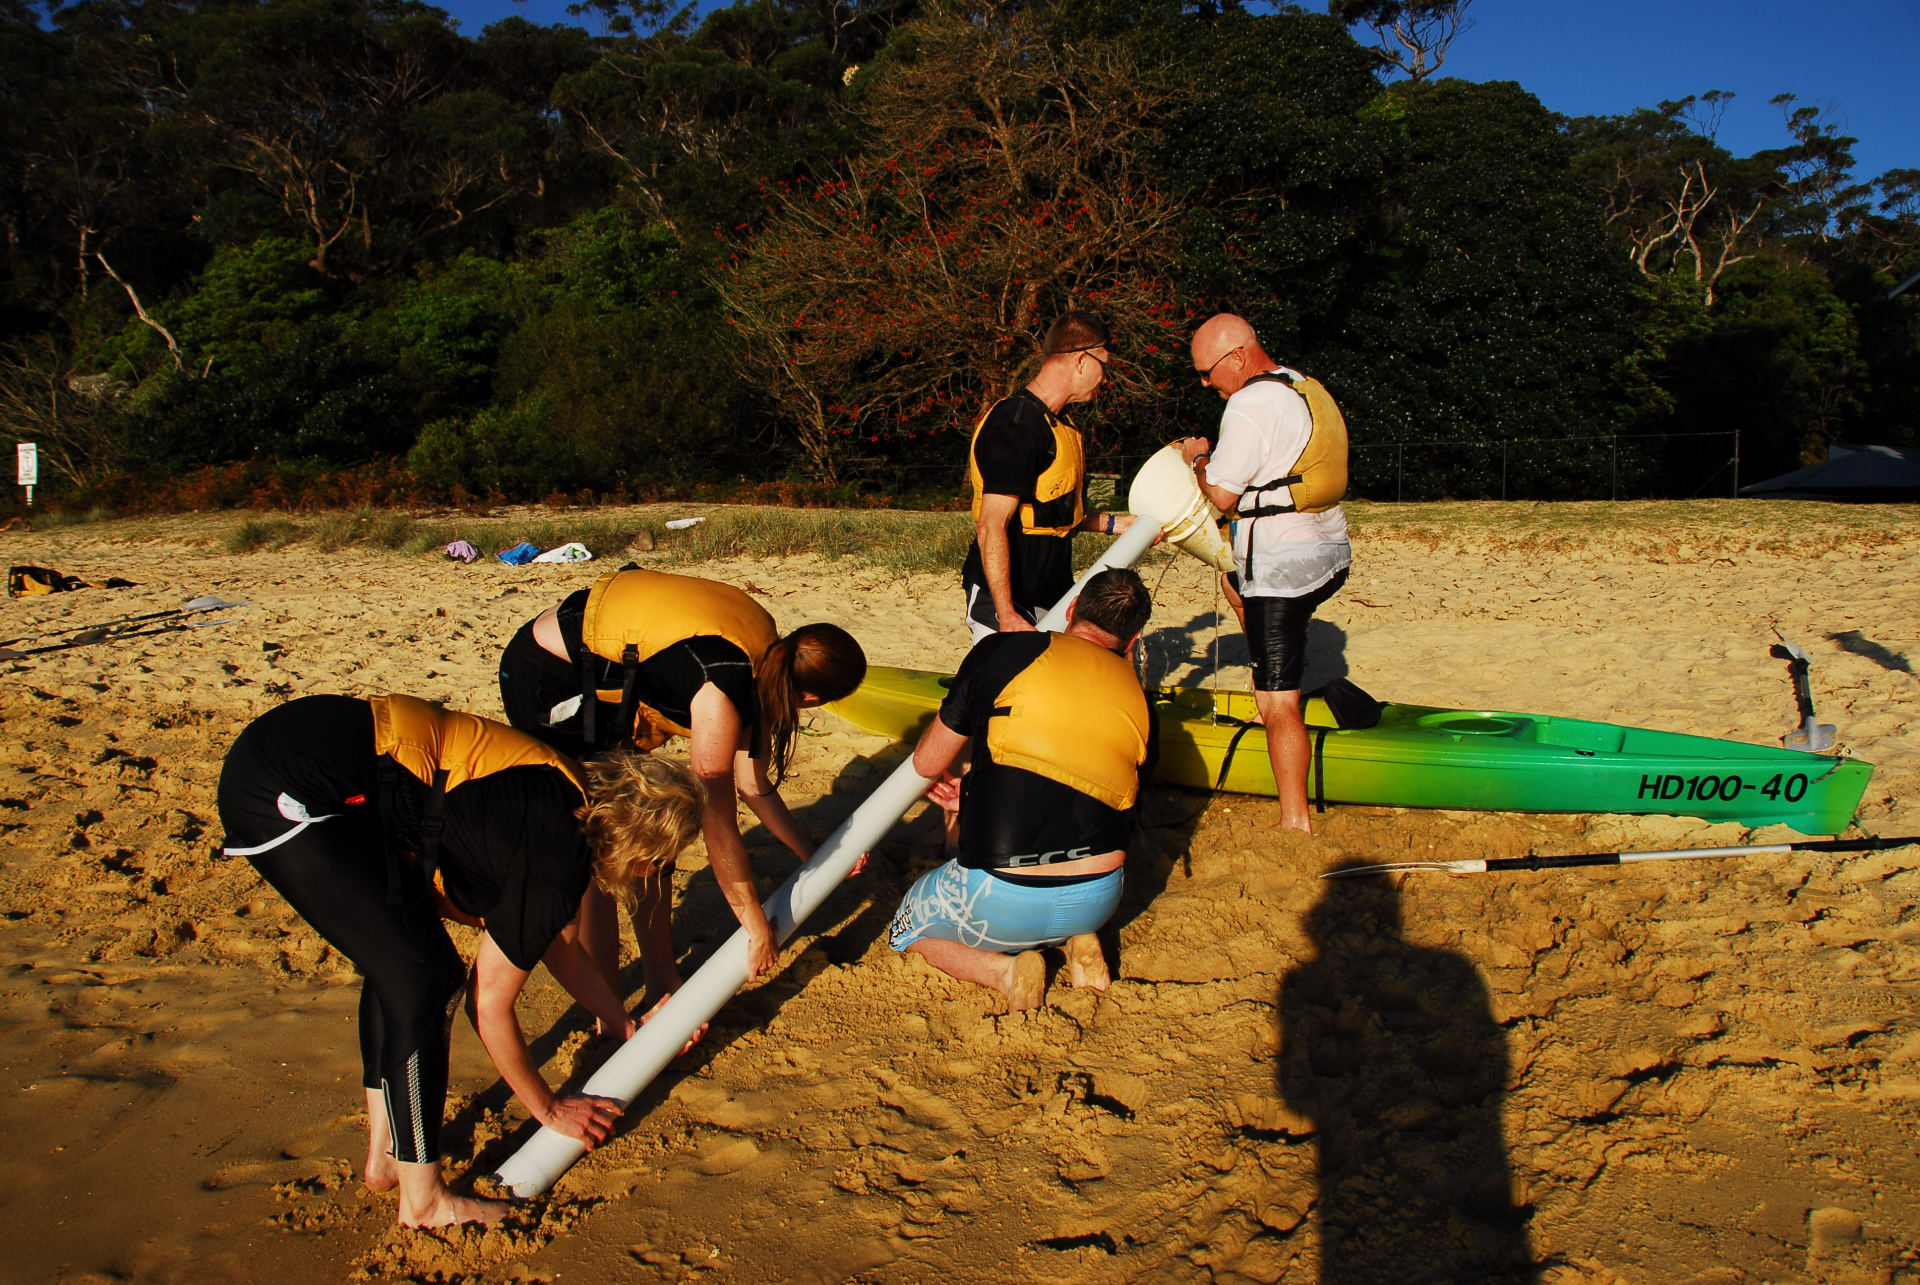 Pipe Fill, Team Building